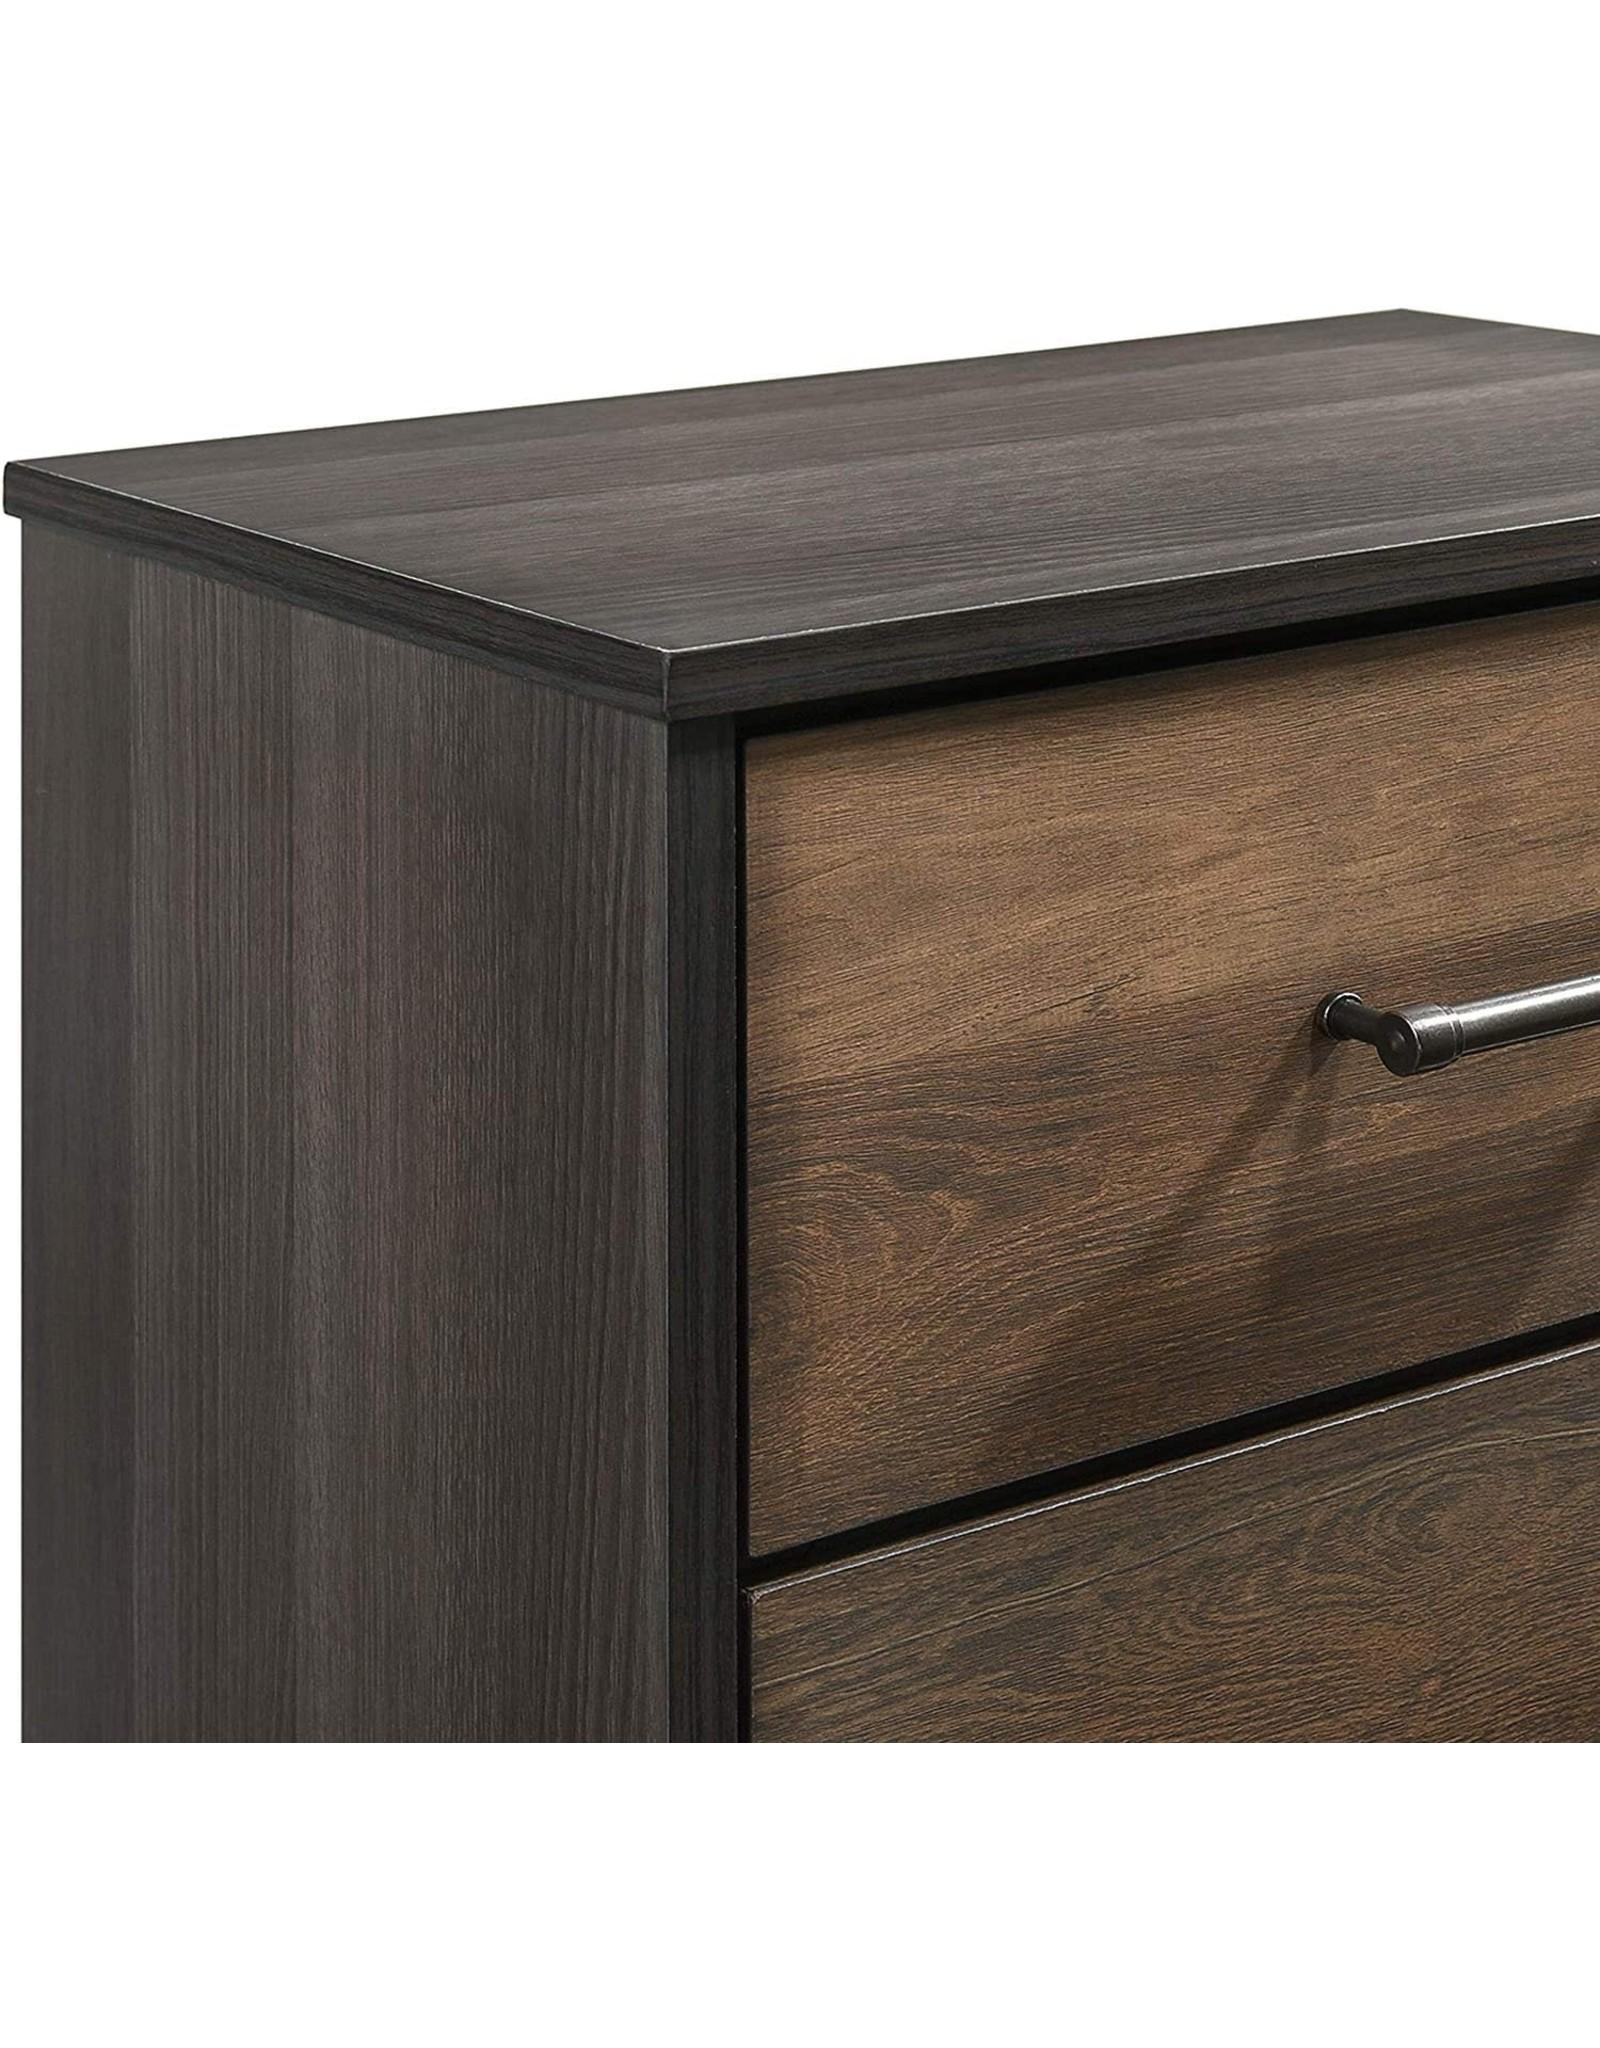 New Classic FURNITURE New Classic Furniture Timarron Nightstand, Two Tone